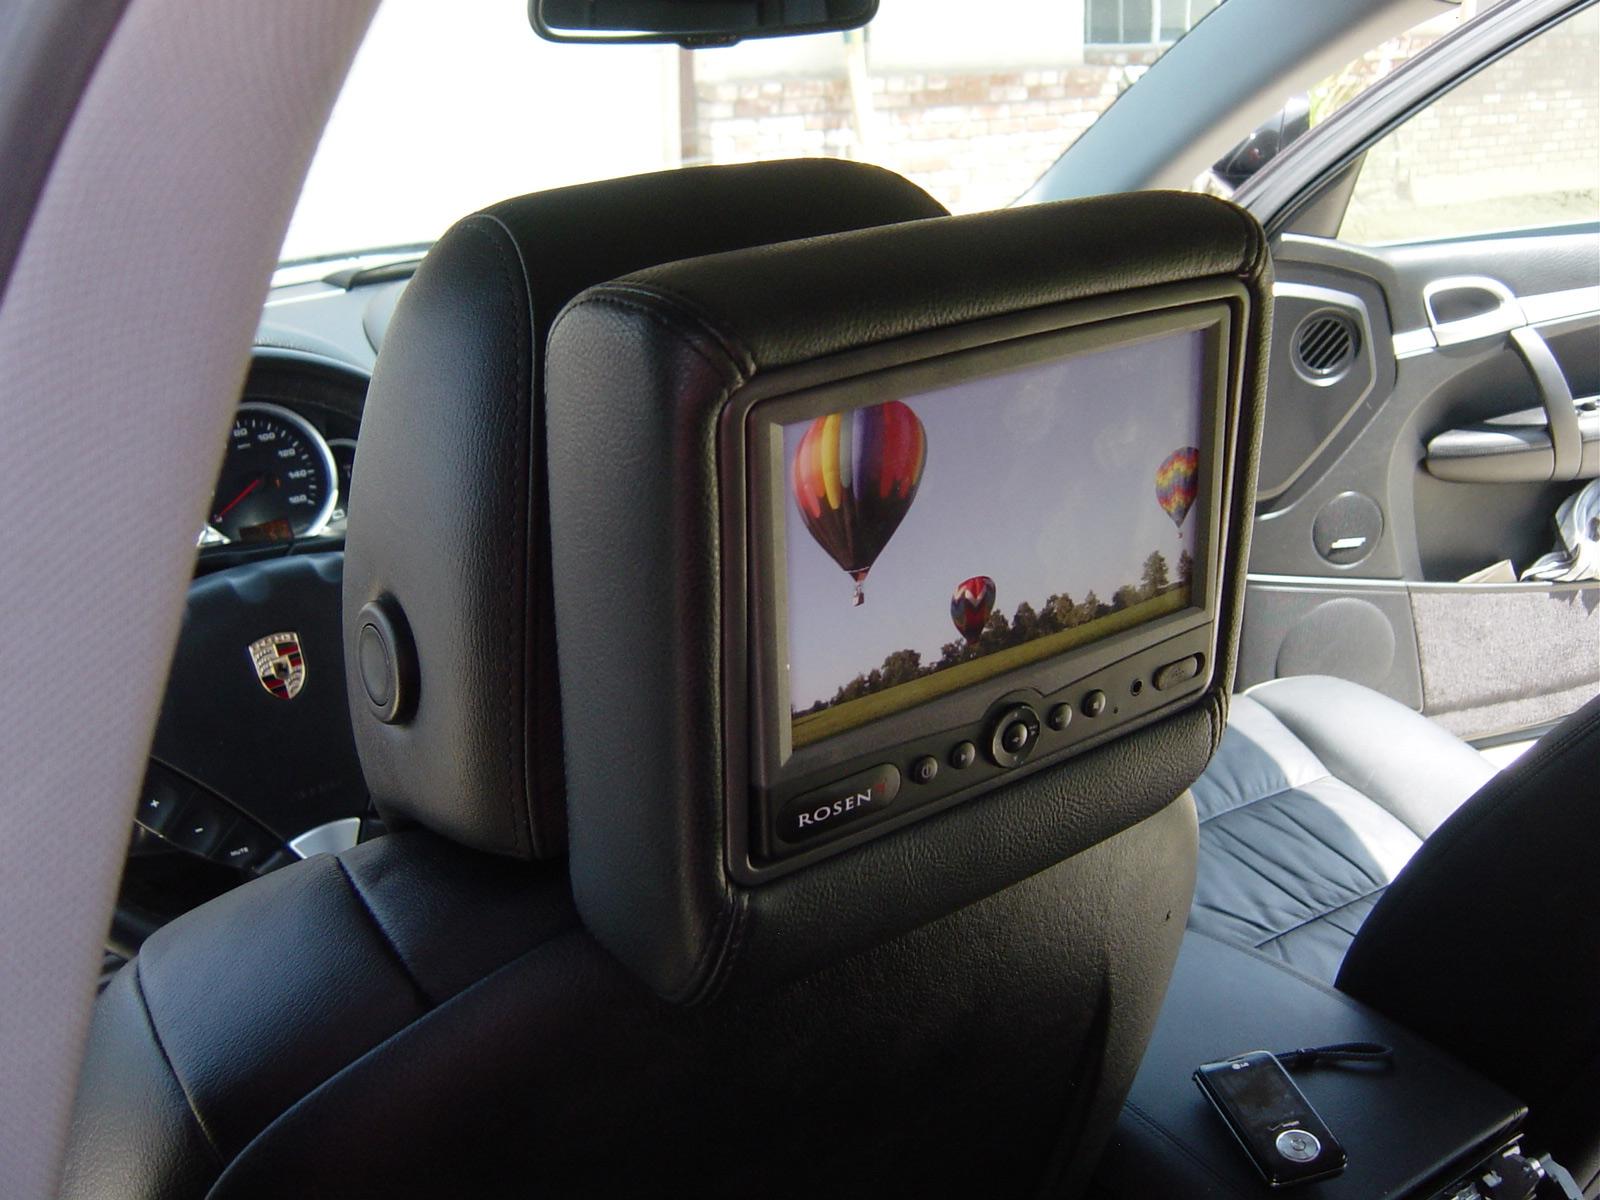 Porsche Cayenne Rear Seat Entertainment Rosen Dvd Headrest